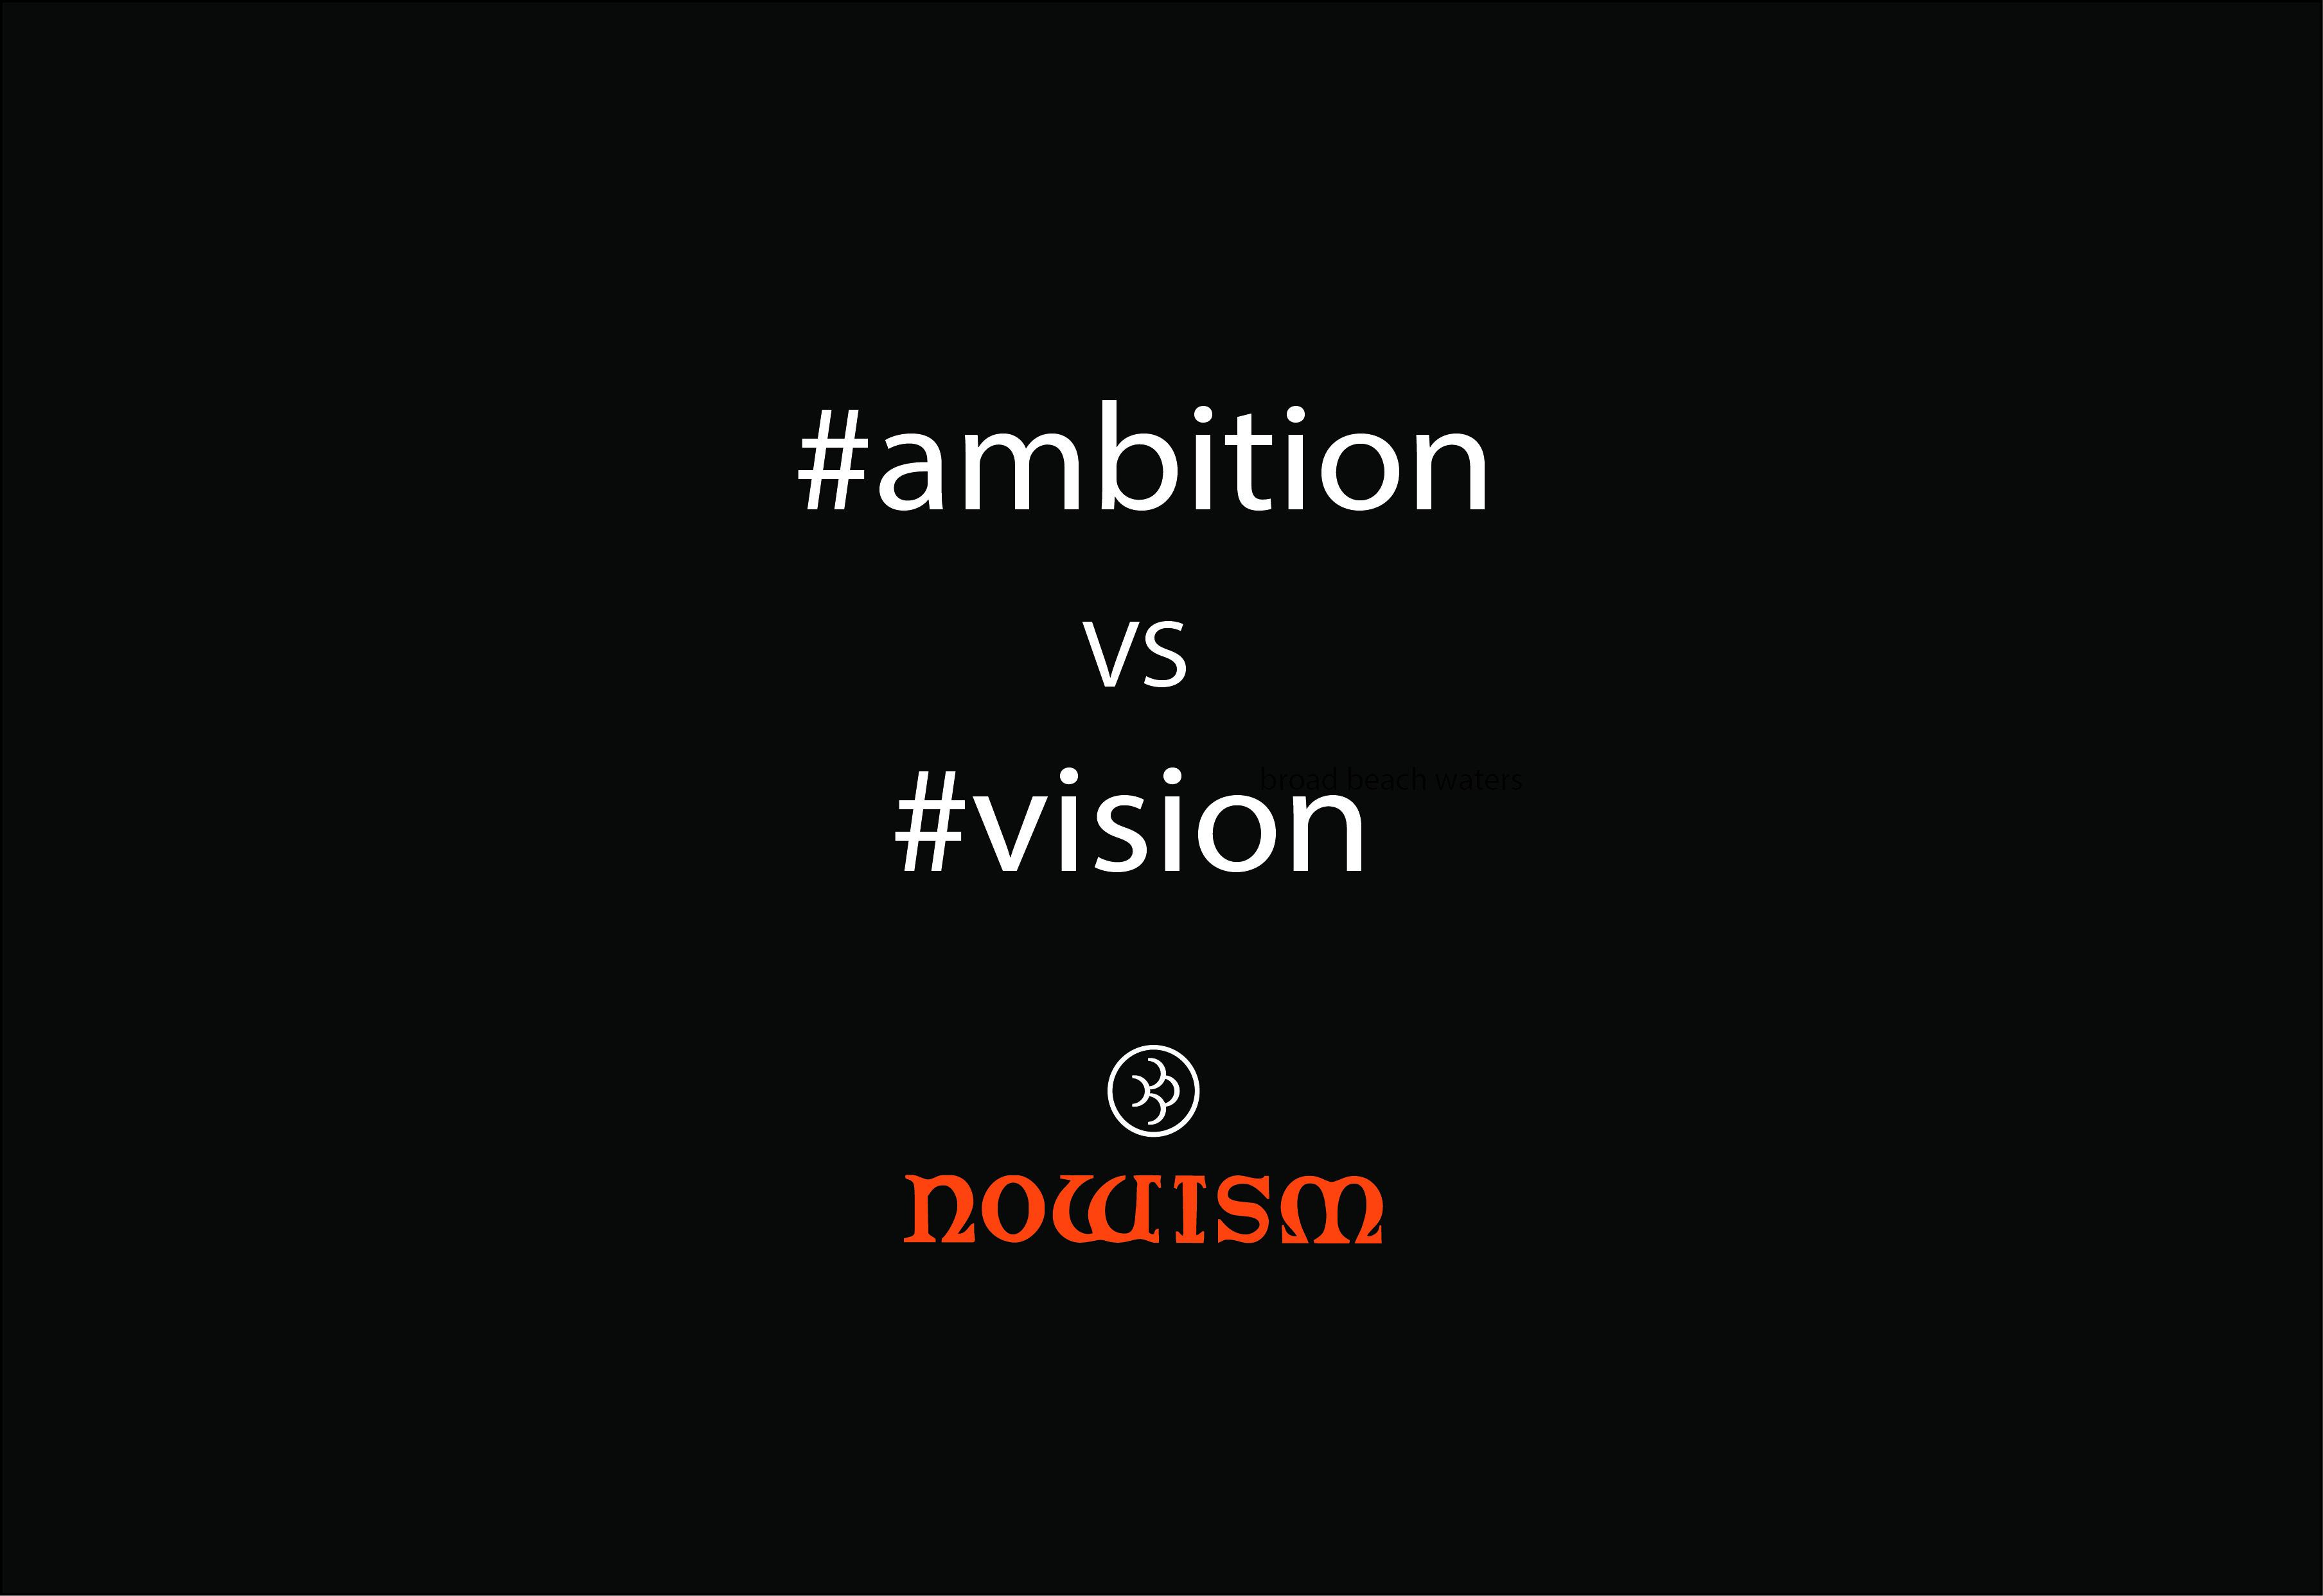 #ambition vs #vision